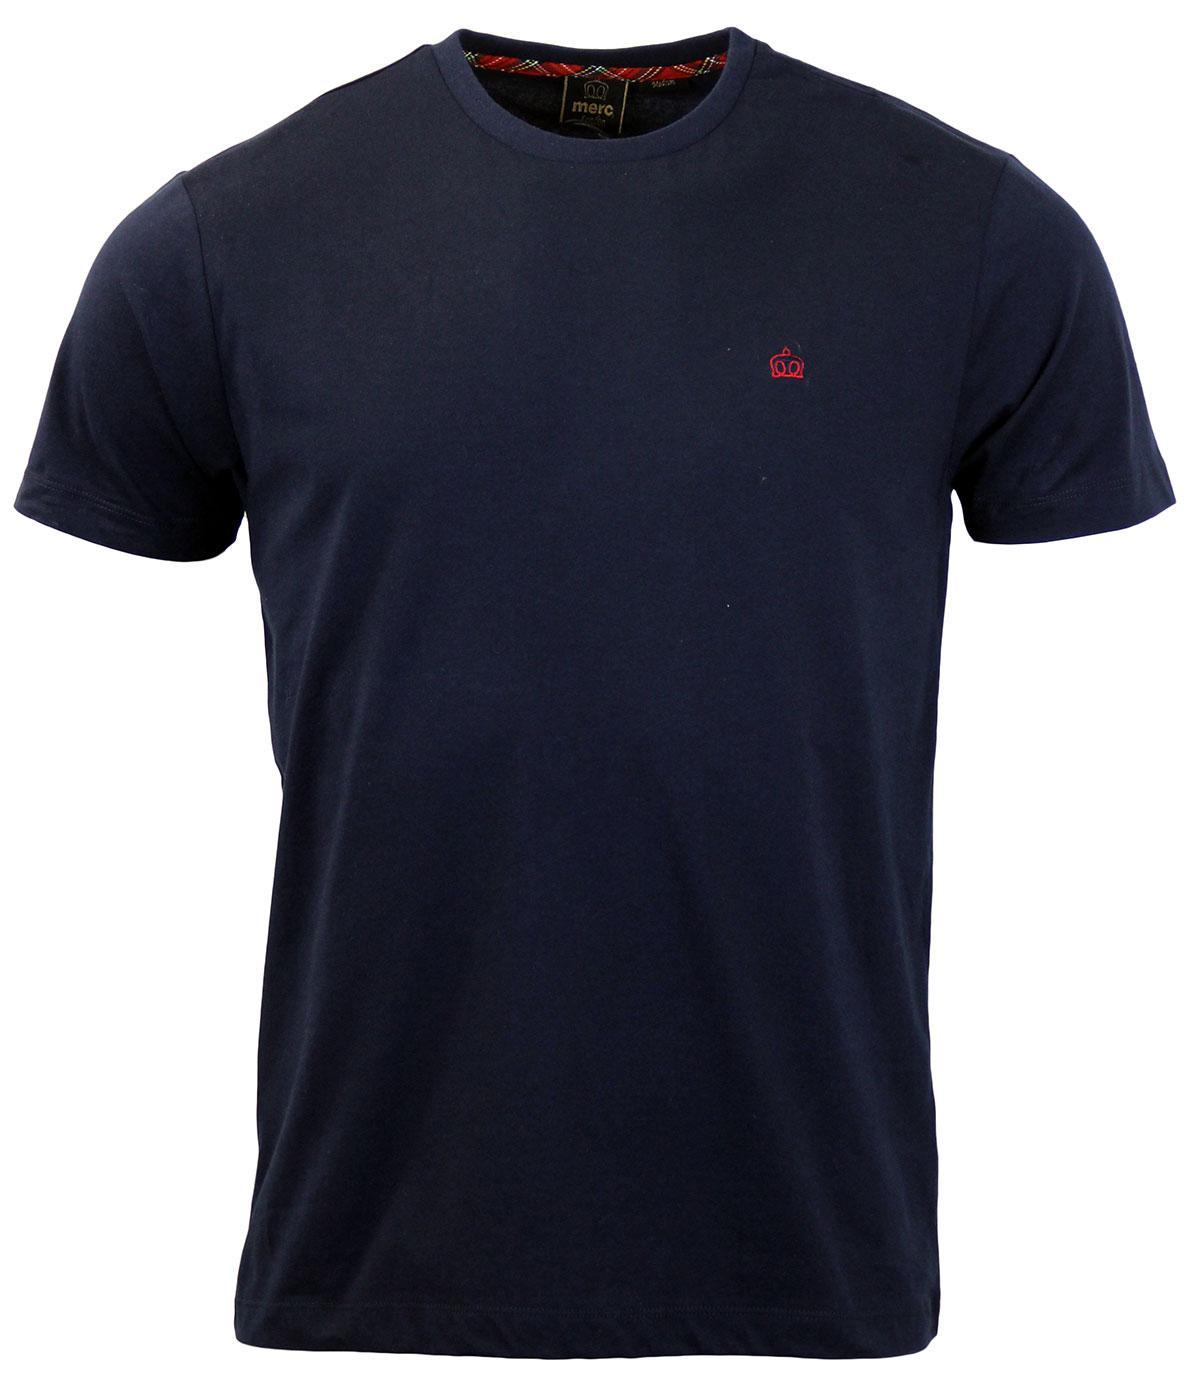 Keyport MERC Retro Mod Plain Crew Neck T-Shirt N